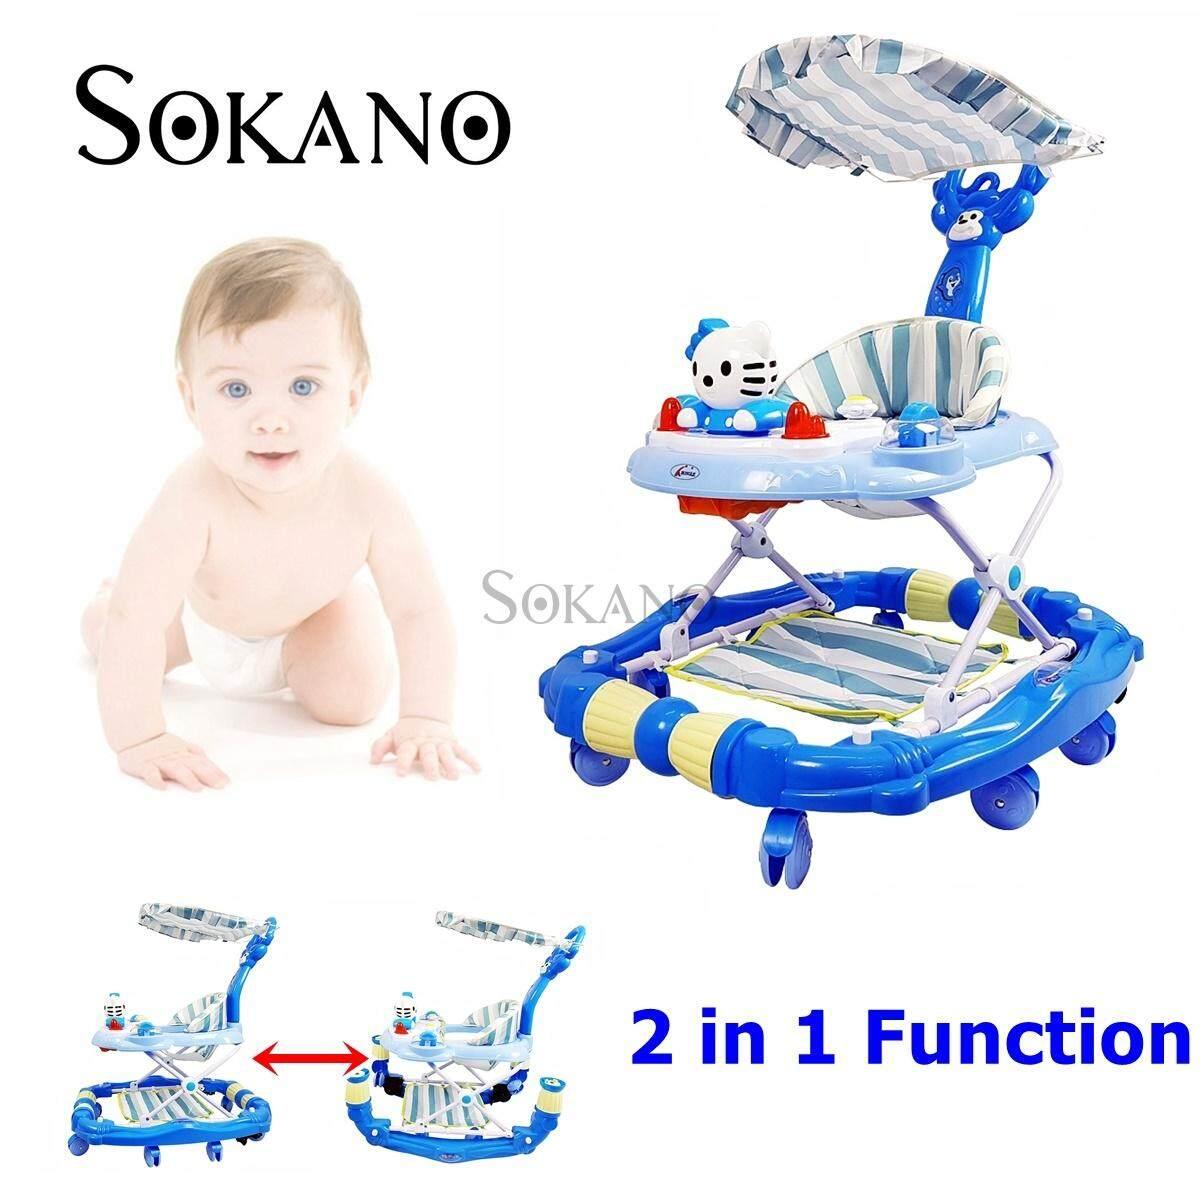 SOKANO Multifunctional Kid Walker With Detachable Roof and Detachable Handle - Blue